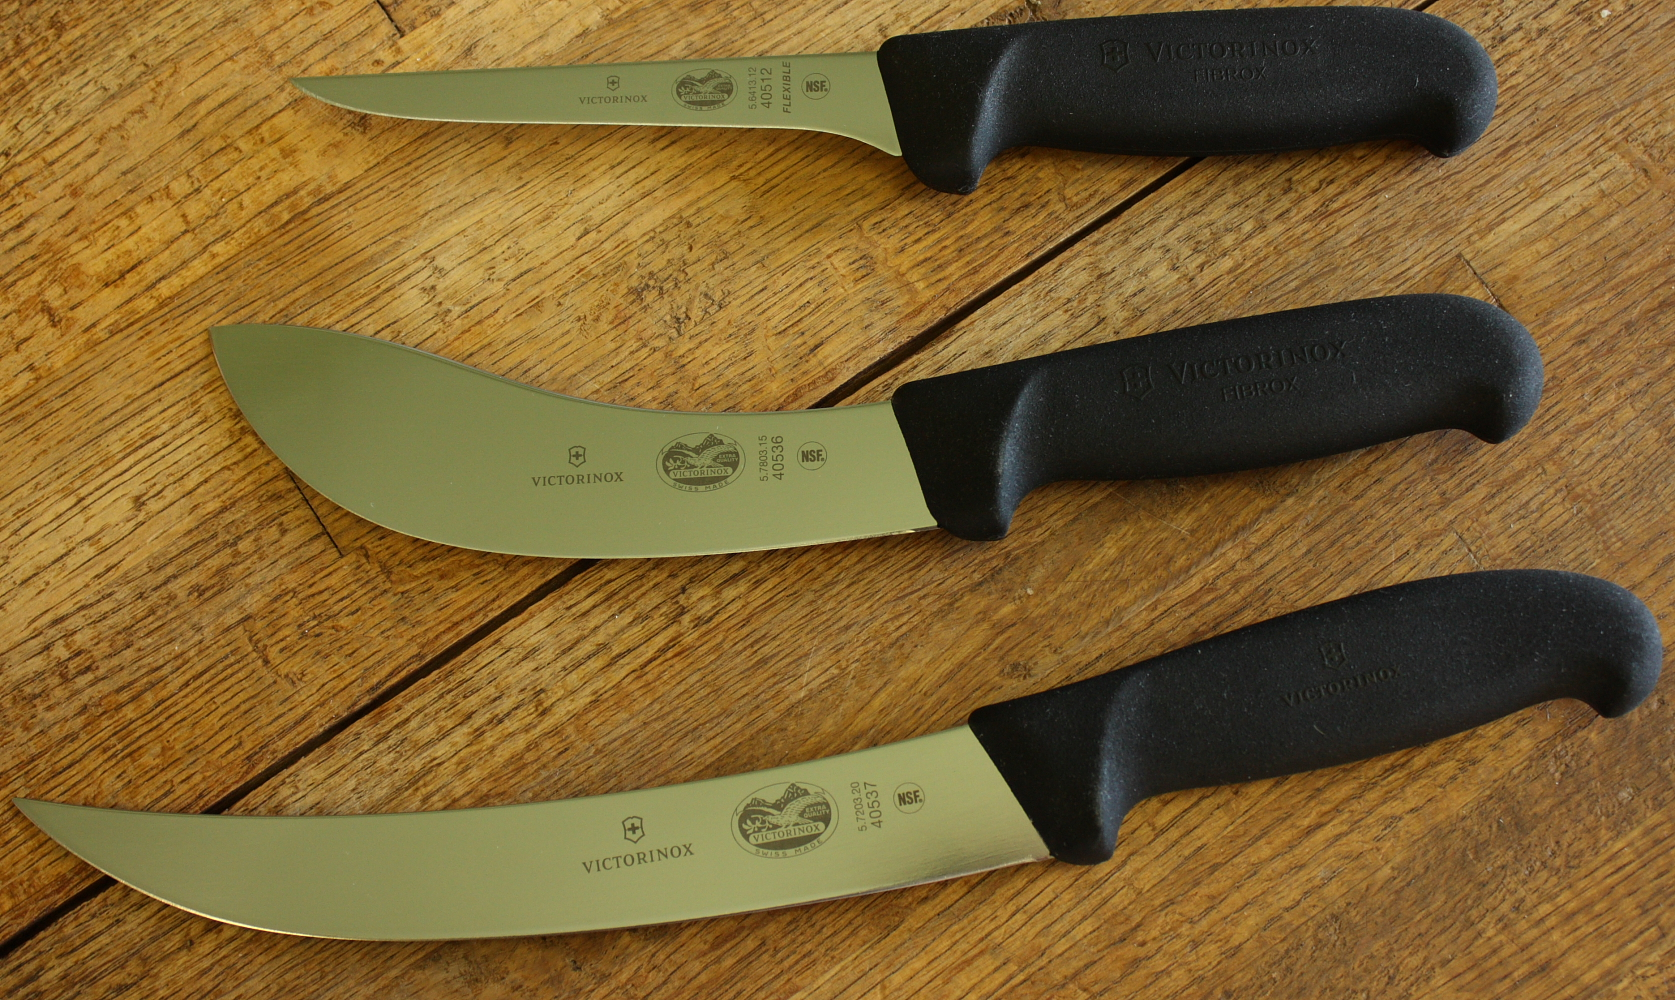 forschner victorinox 3 25 inch paring knives purchase the forschner 5 inch boning knife forschner 6 inch skinning knife and the forschner